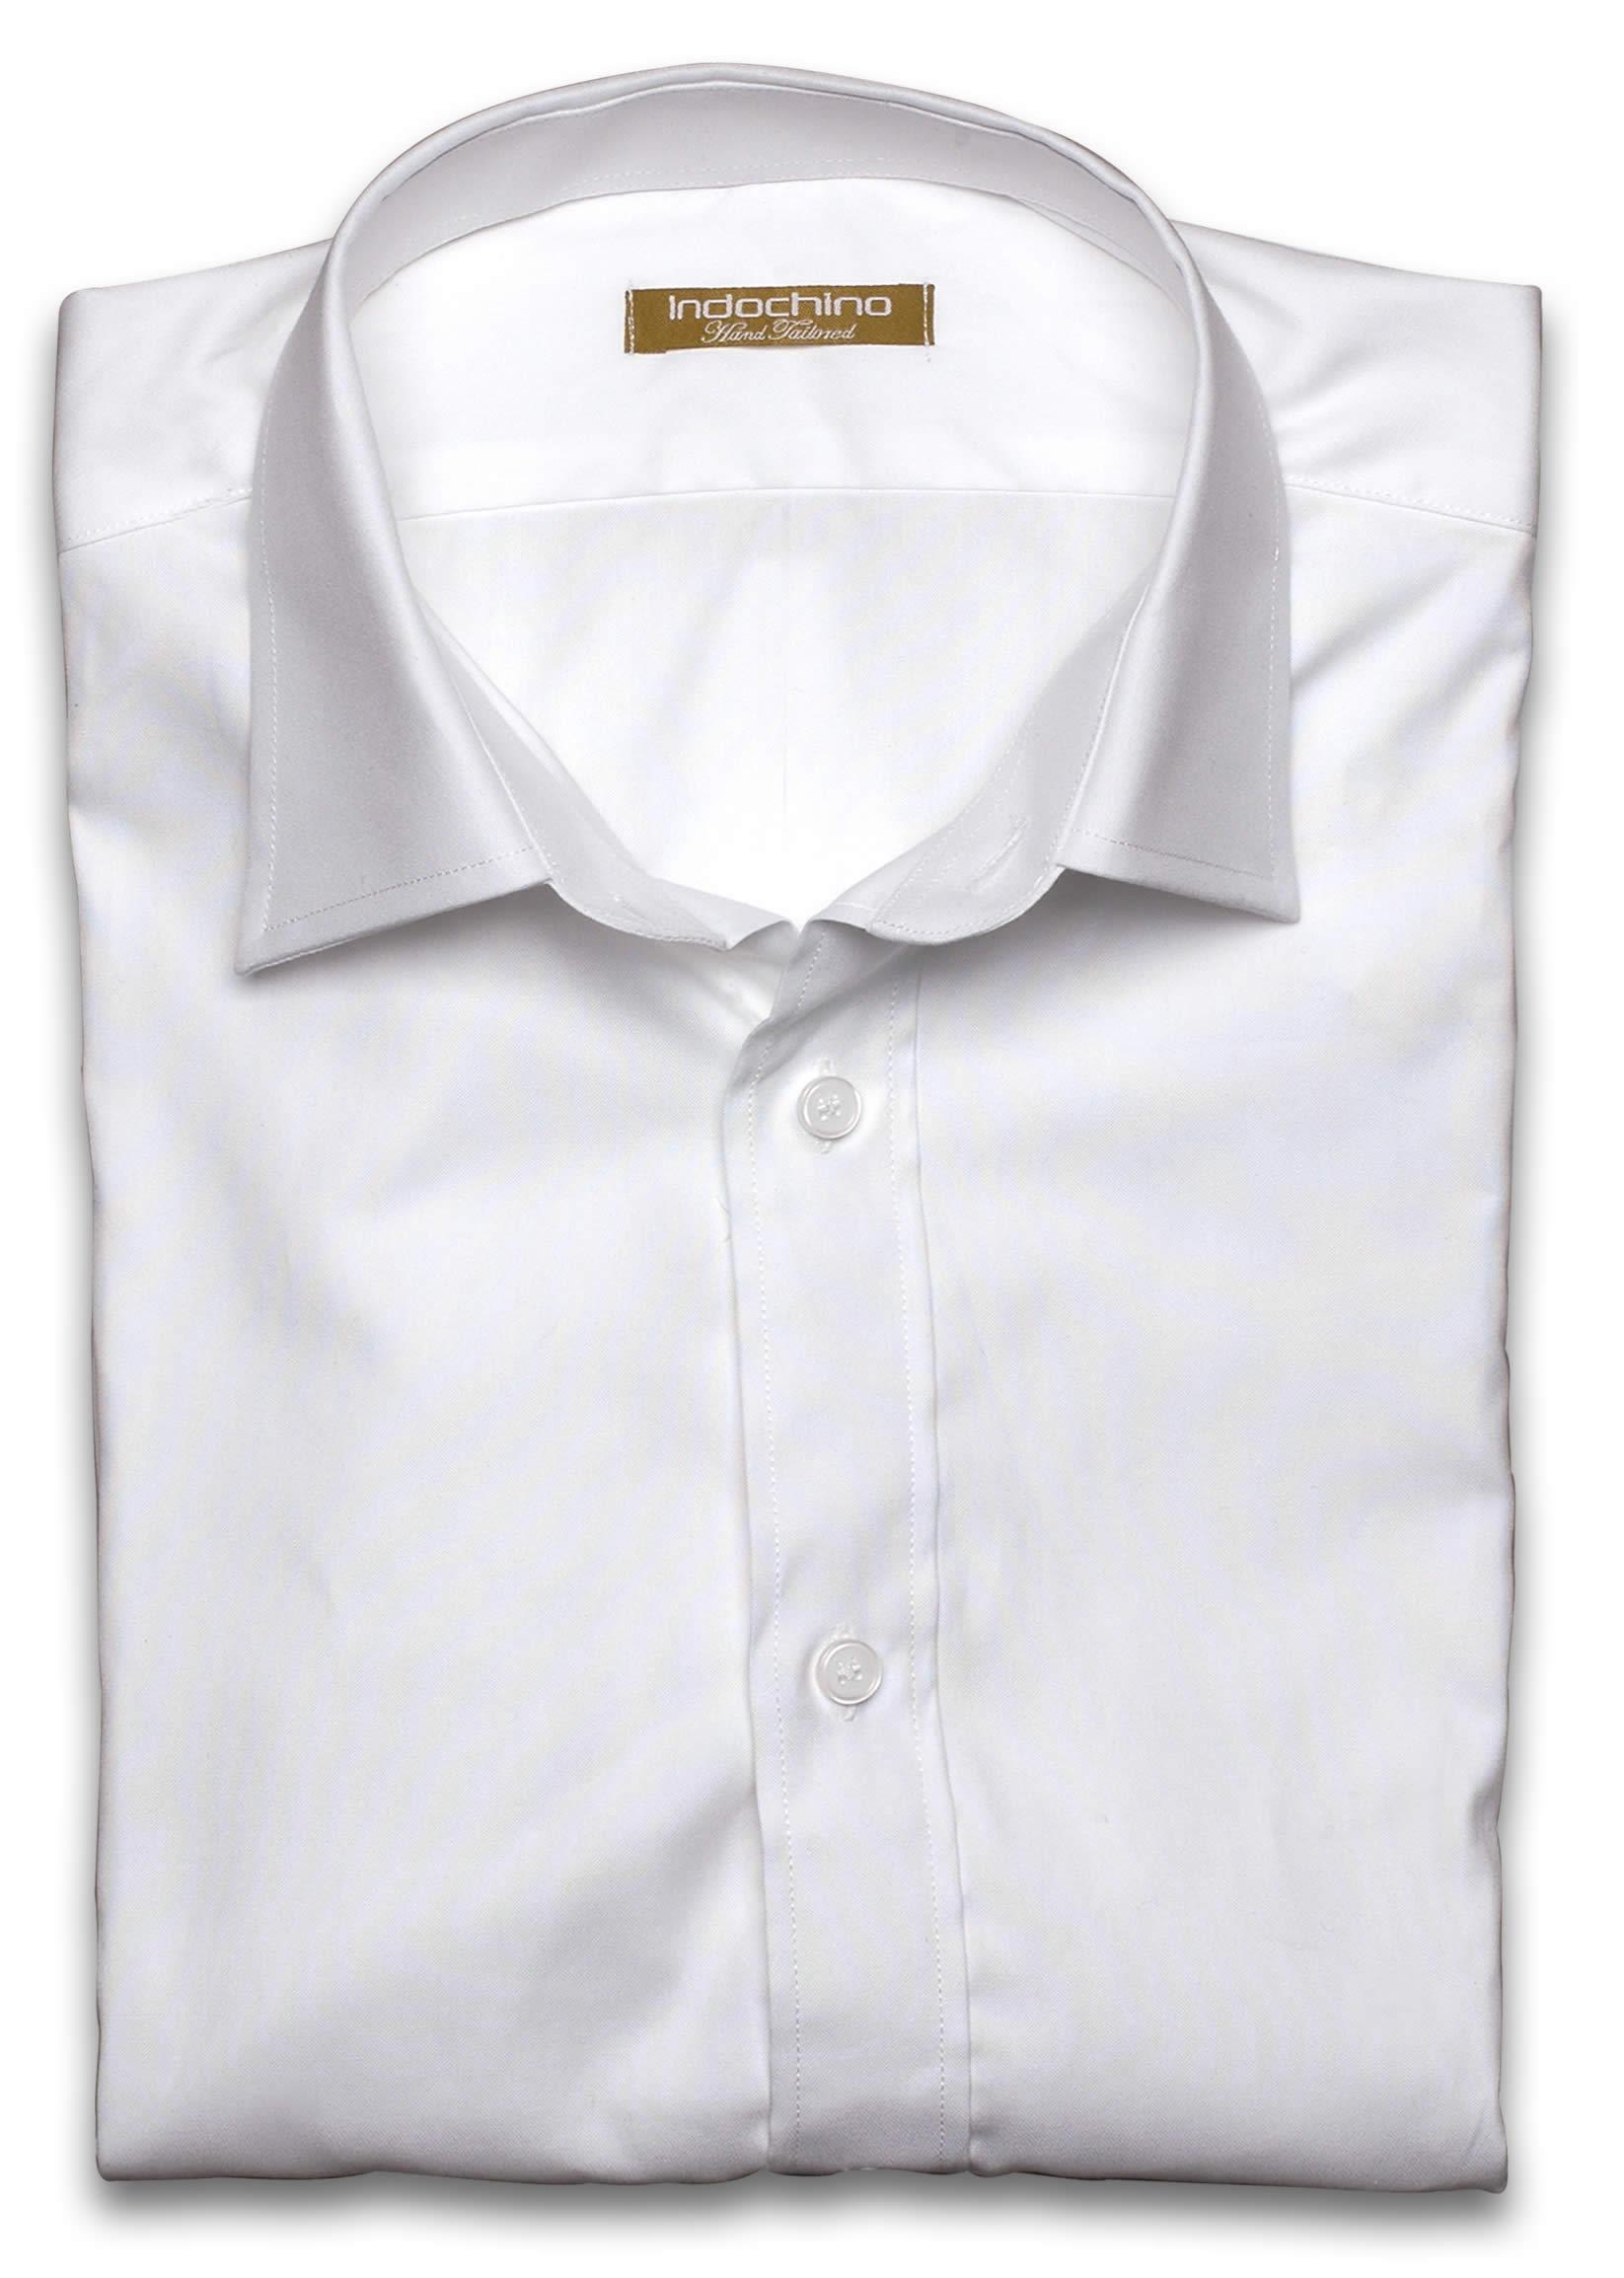 Camasa, un cadou mereu la moda pentru domni in prag de sarbatori